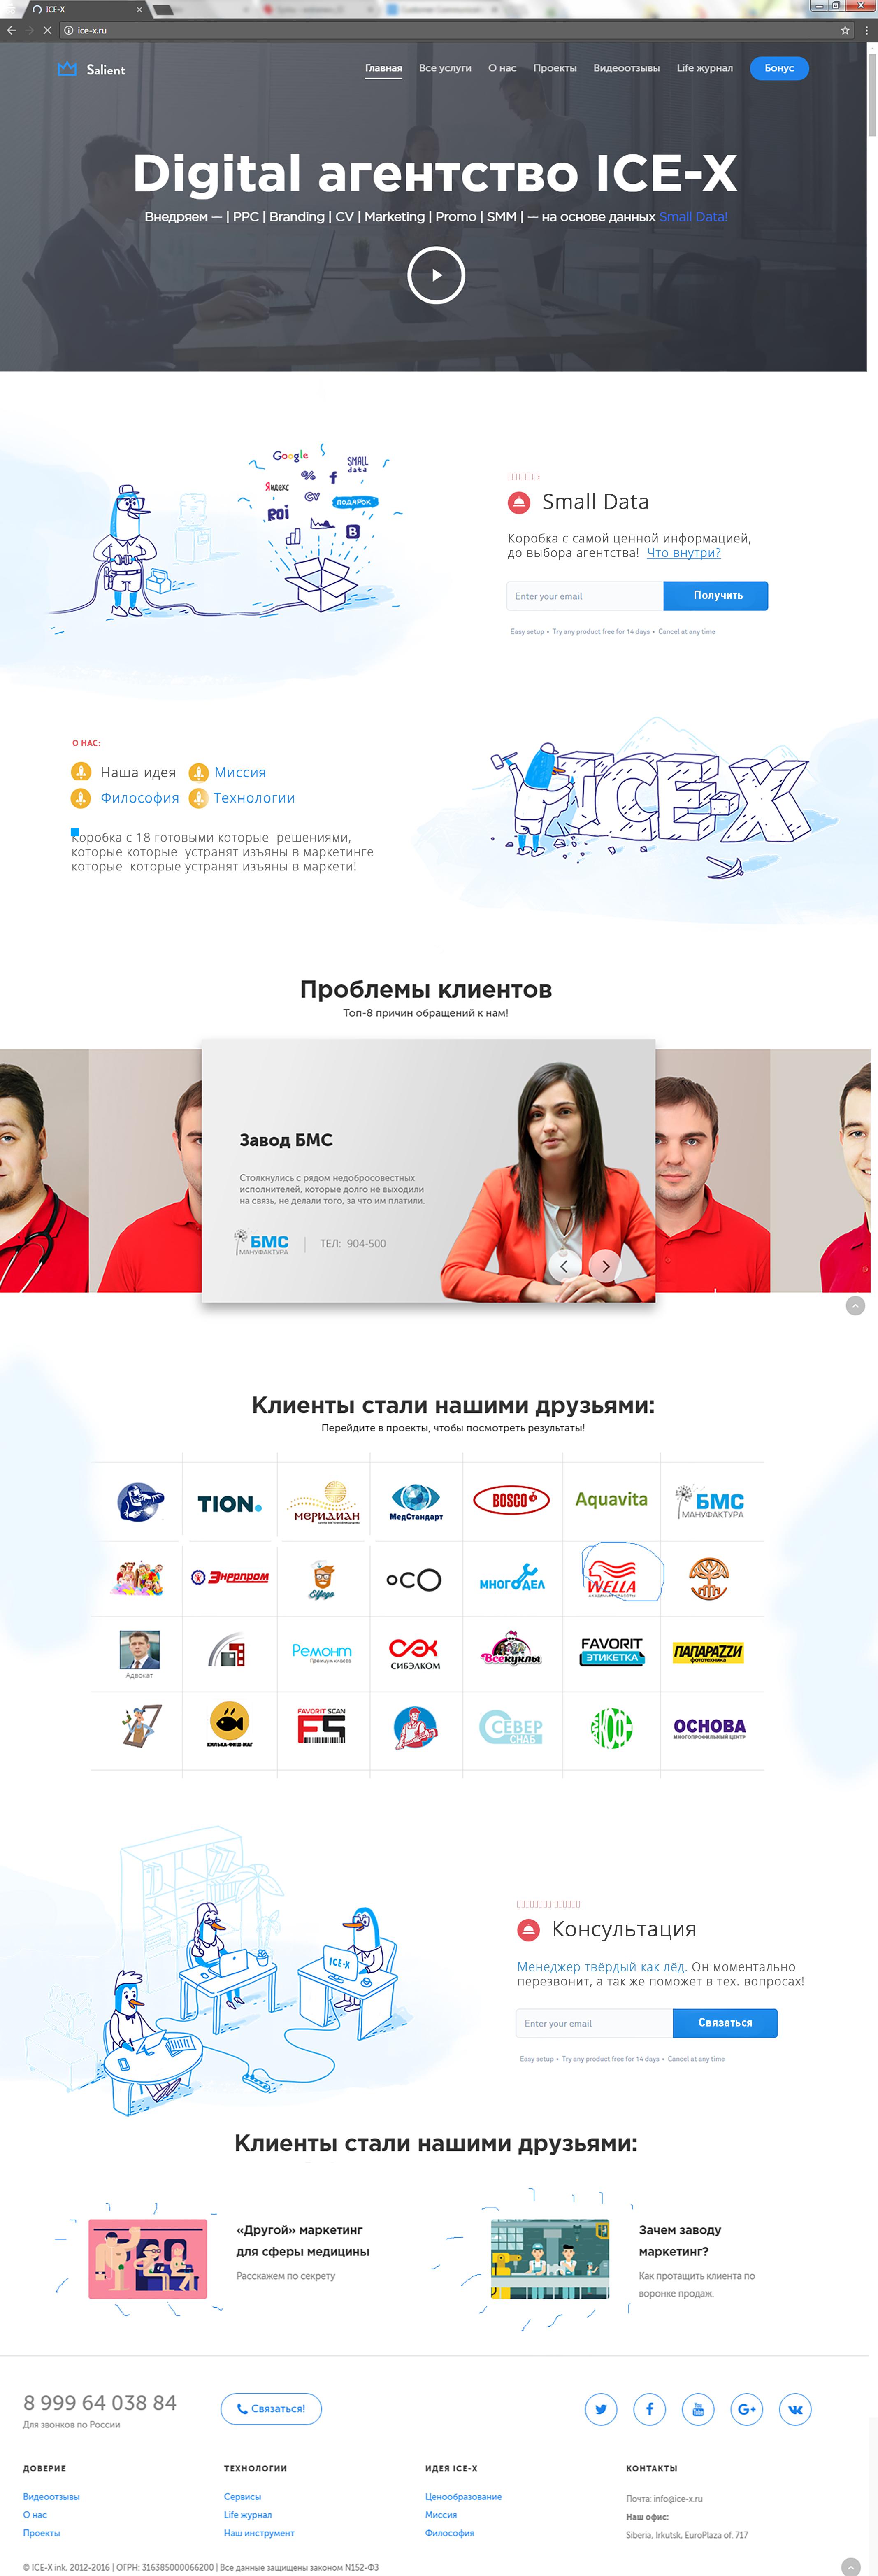 ICE-X, сайт digital агенства